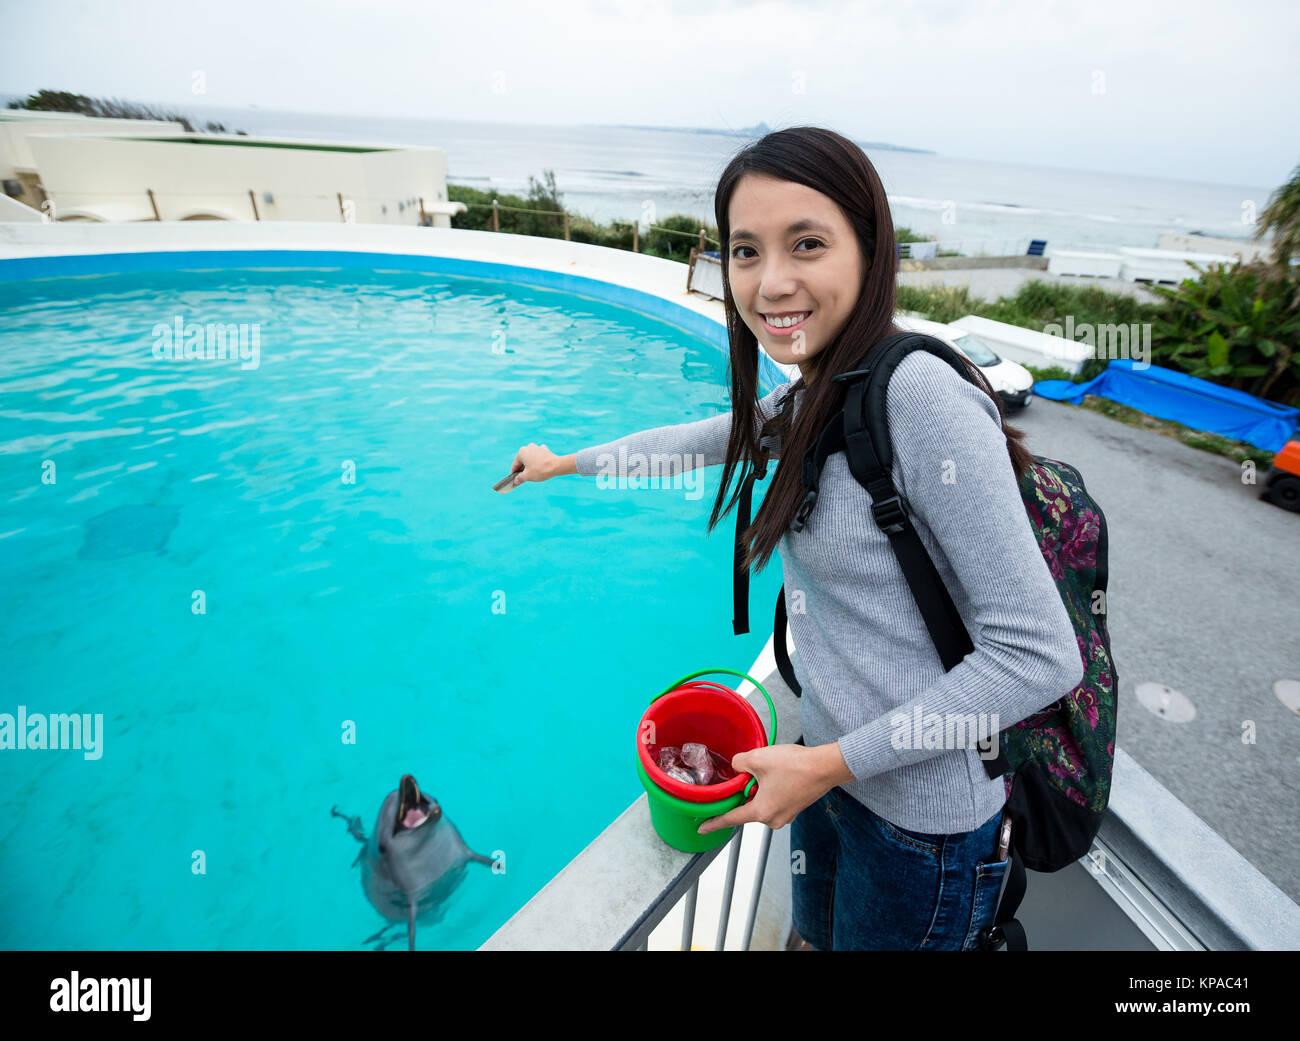 Young Woman feeding dolphin in aquarium - Stock Image